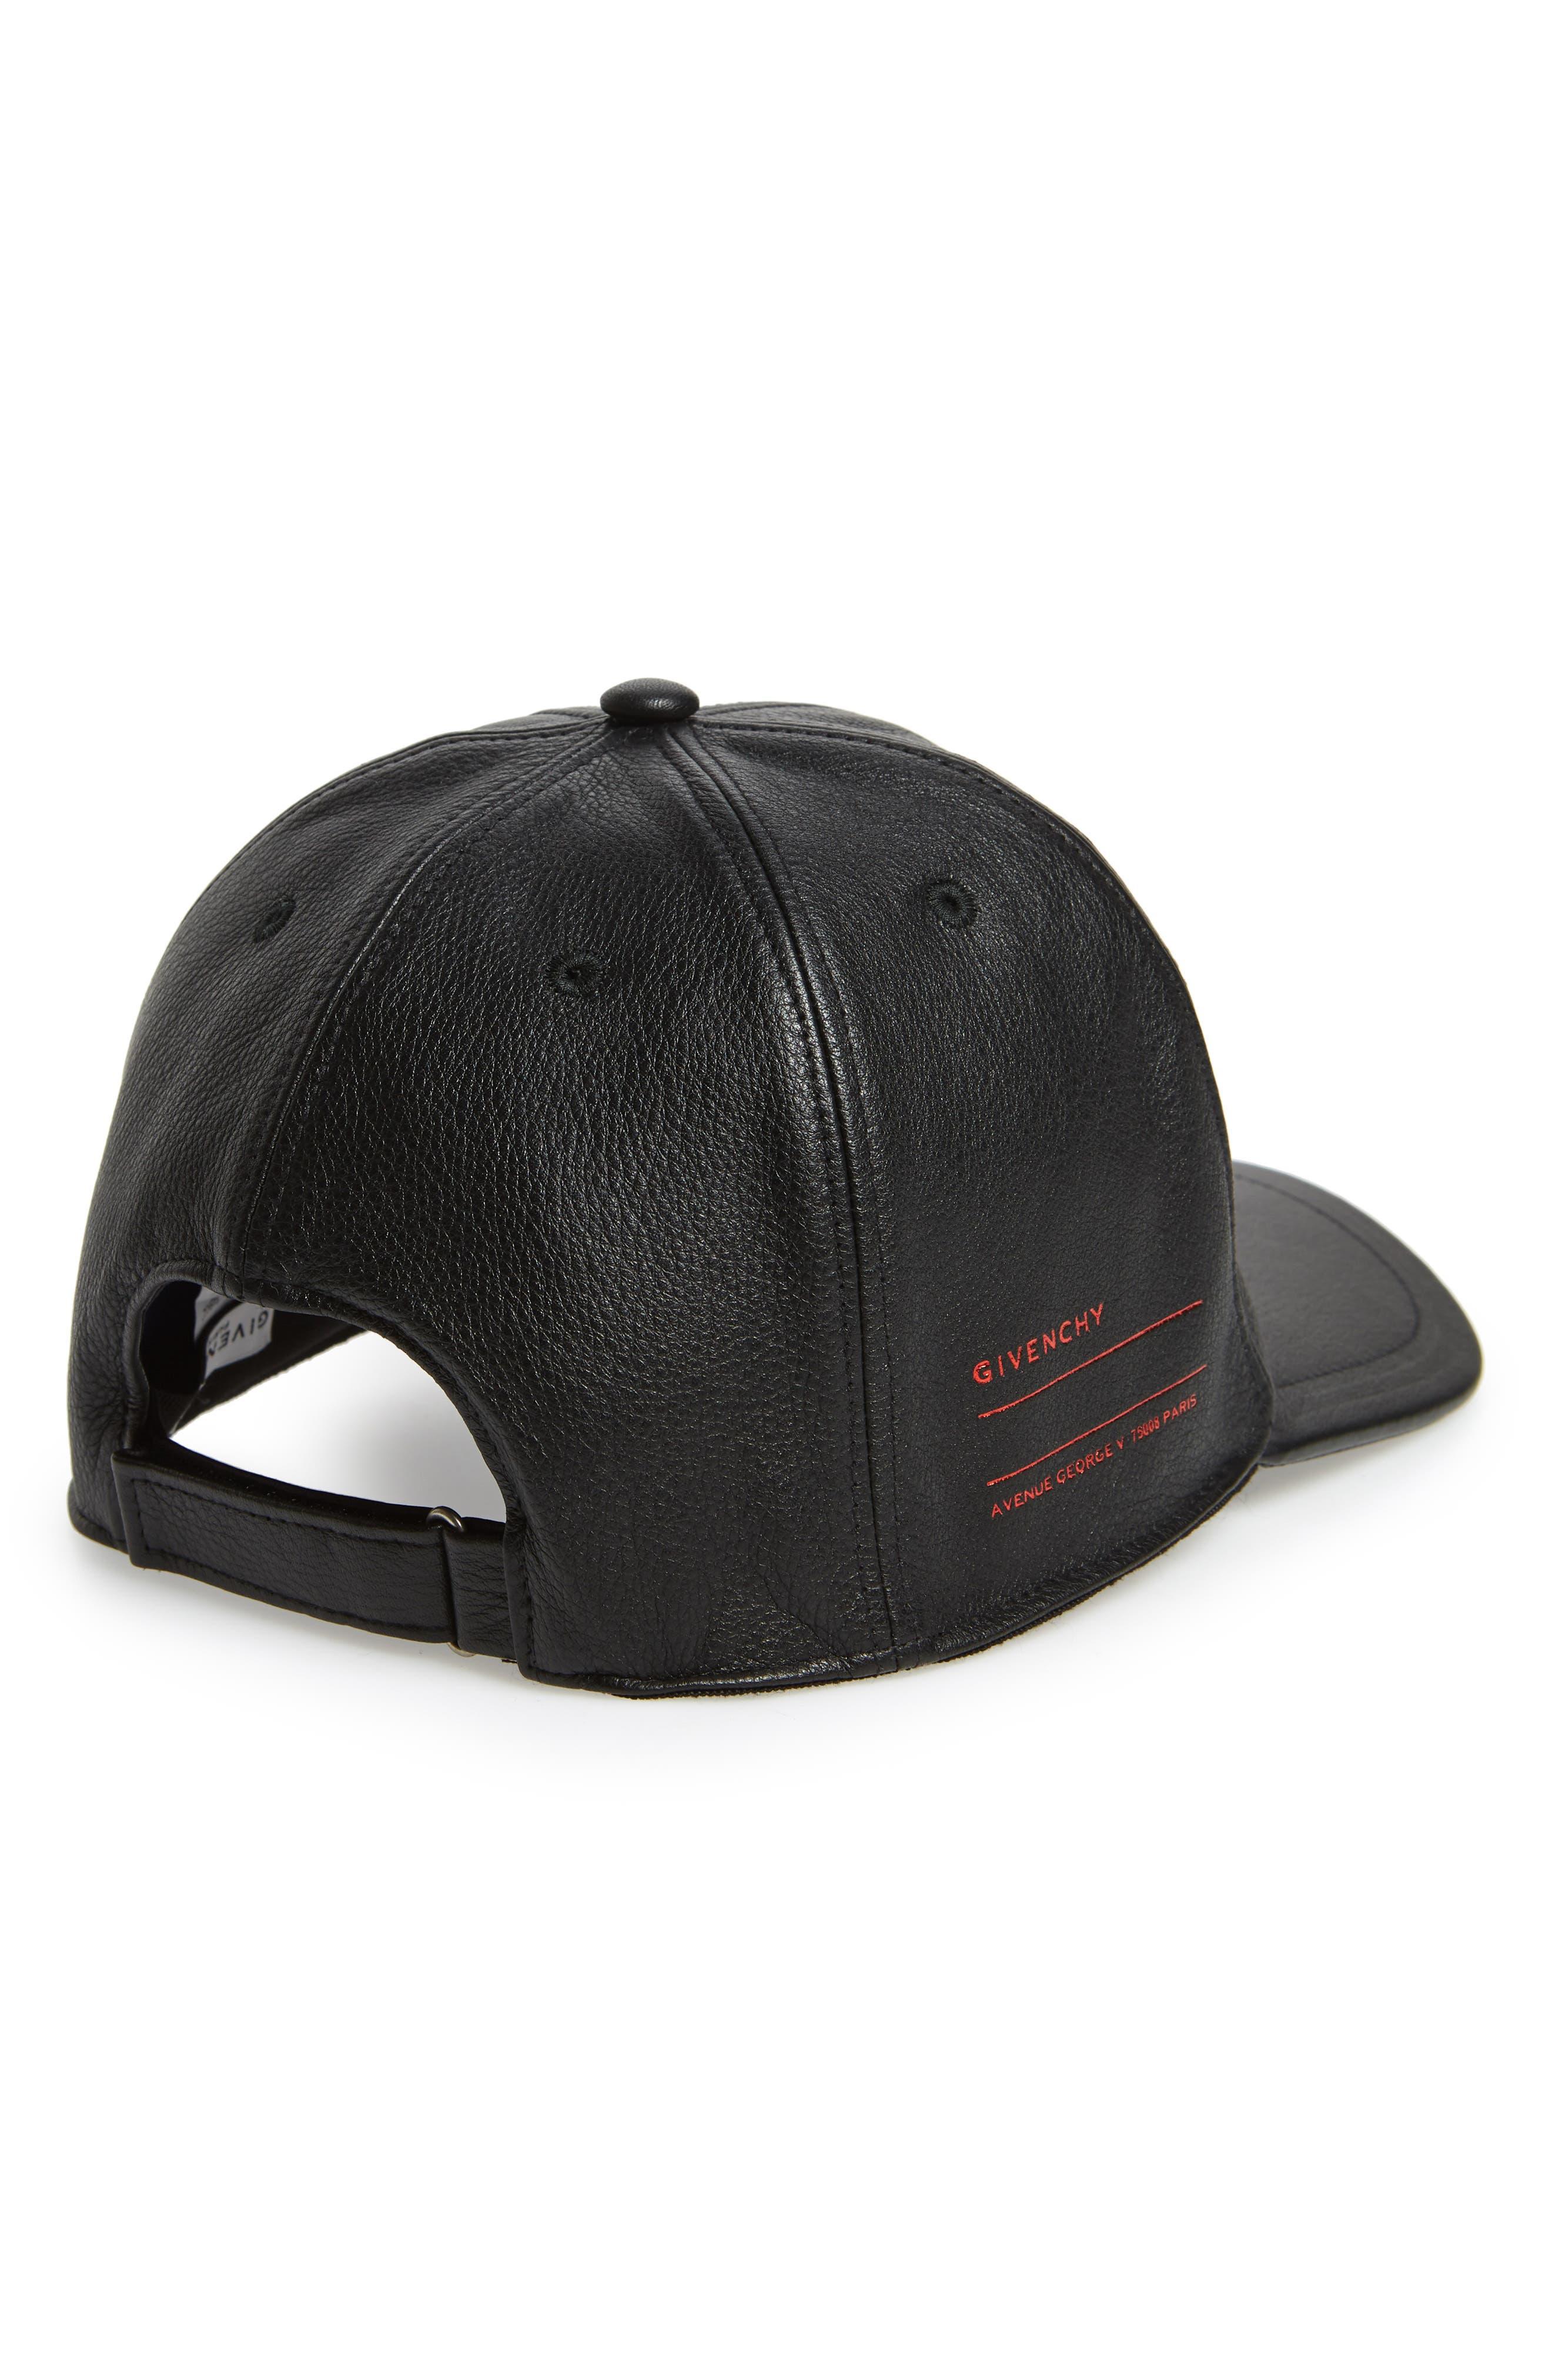 Leather Ball Cap,                             Alternate thumbnail 2, color,                             005